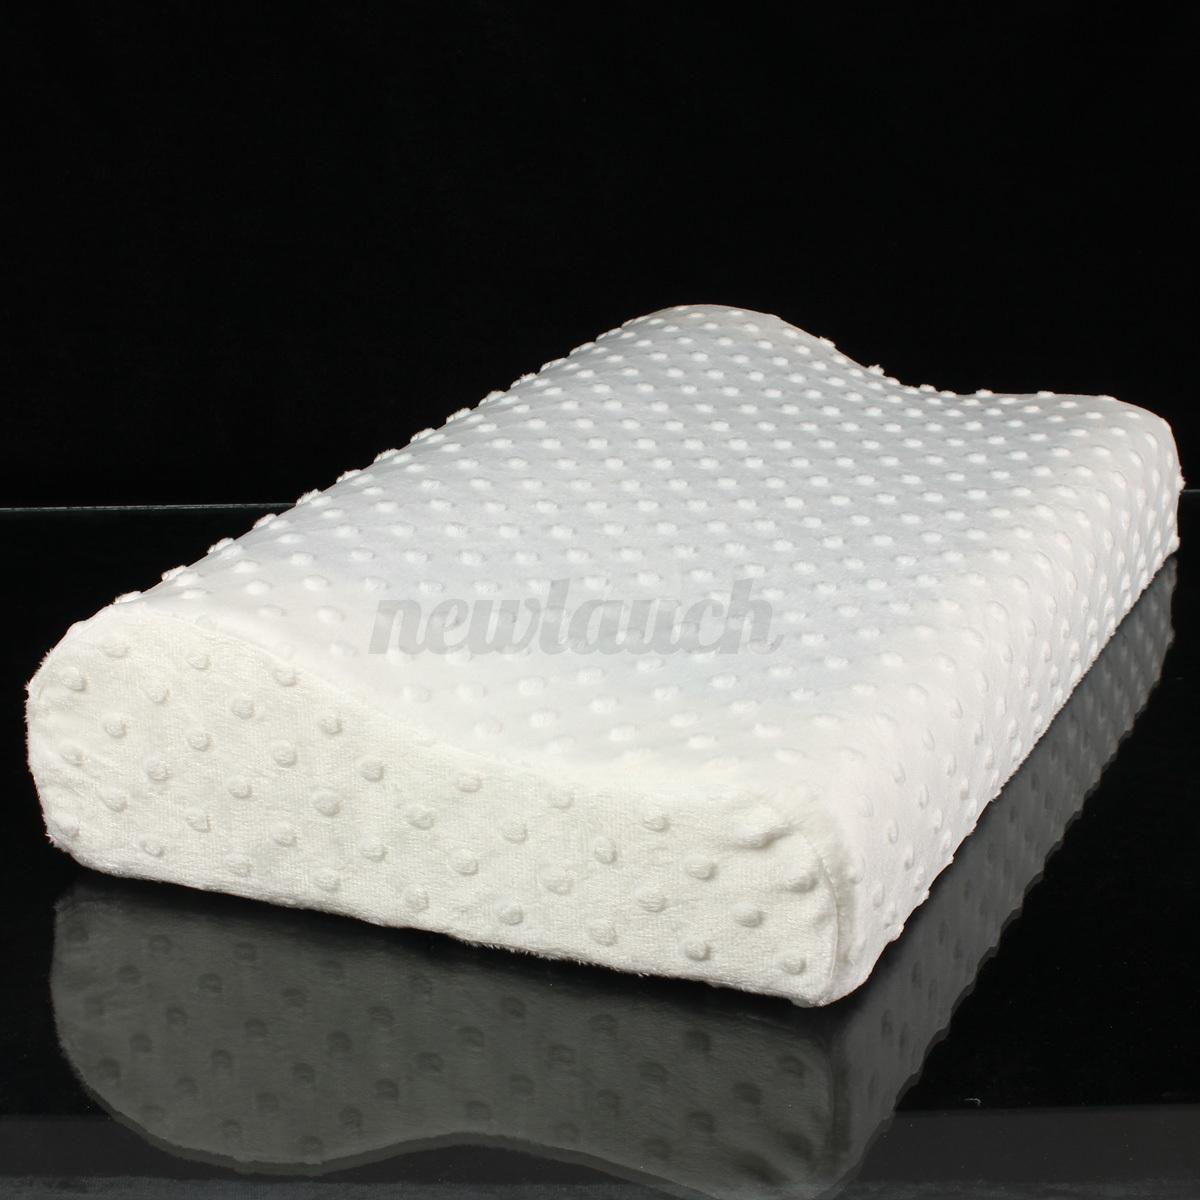 Contour Memory Foam Comfort Cooling Gel Pillow